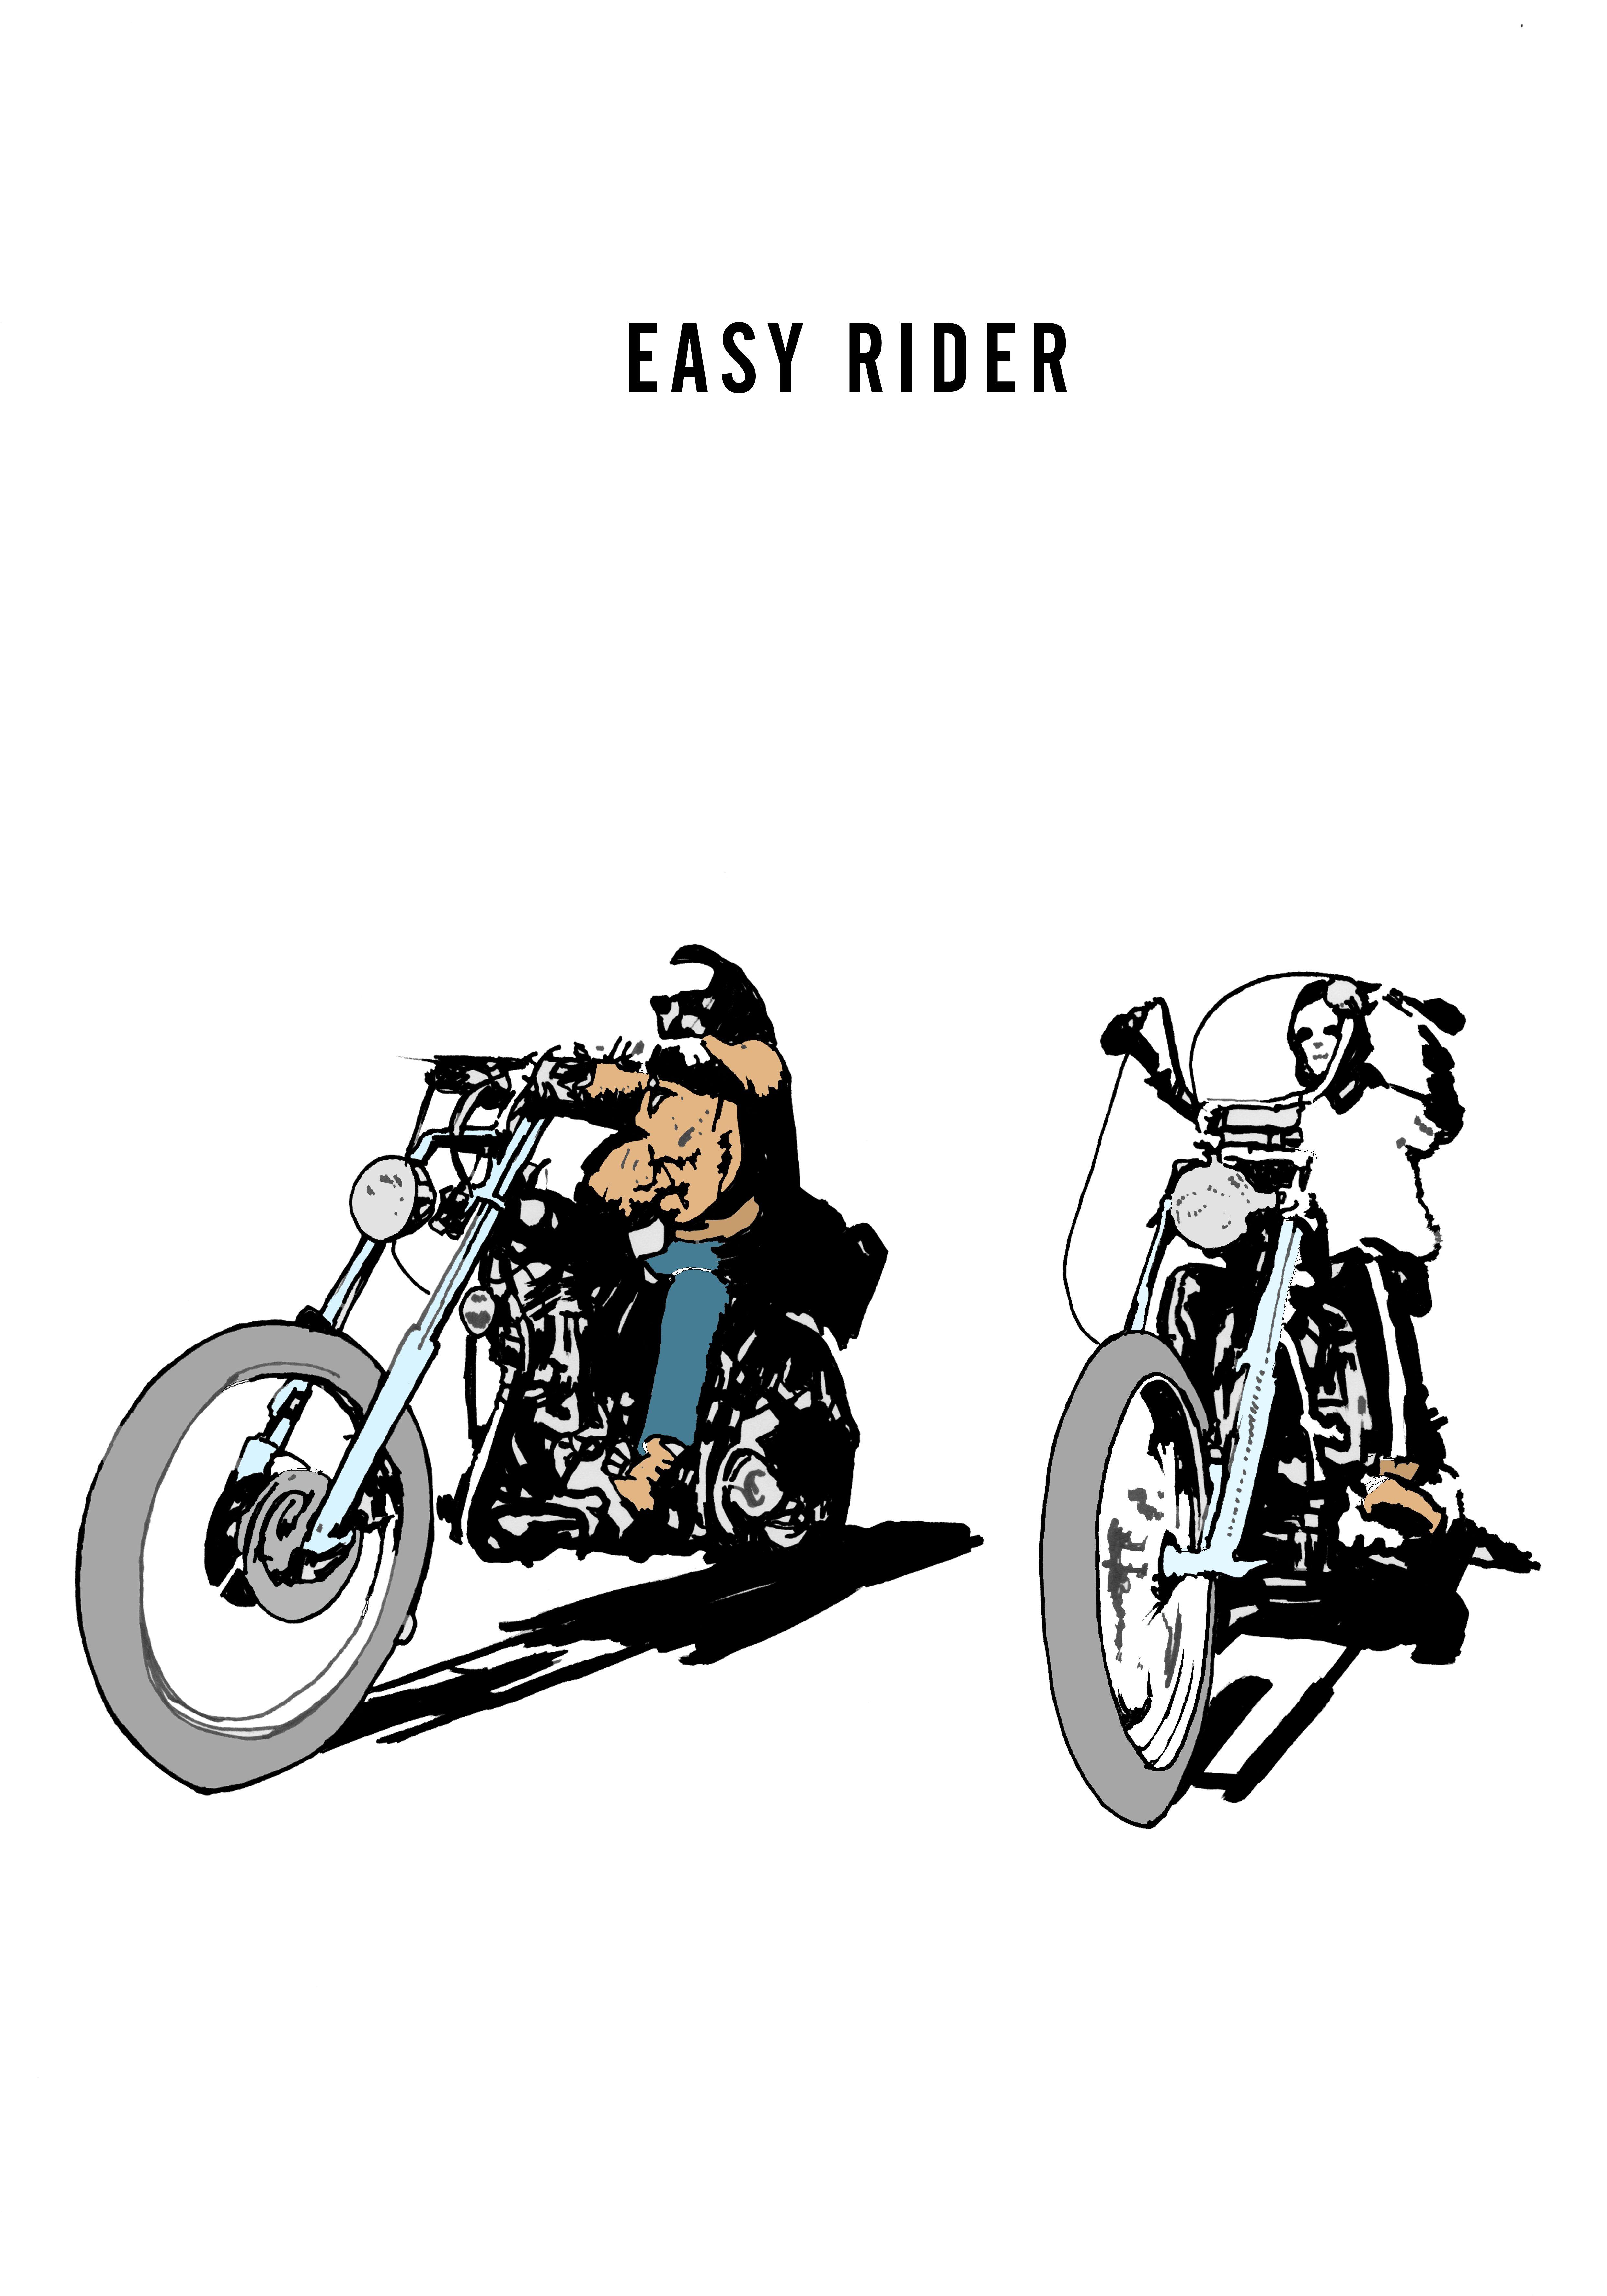 Easy Rider Draw Easyrider Movie Poster Motorcycle Illustration